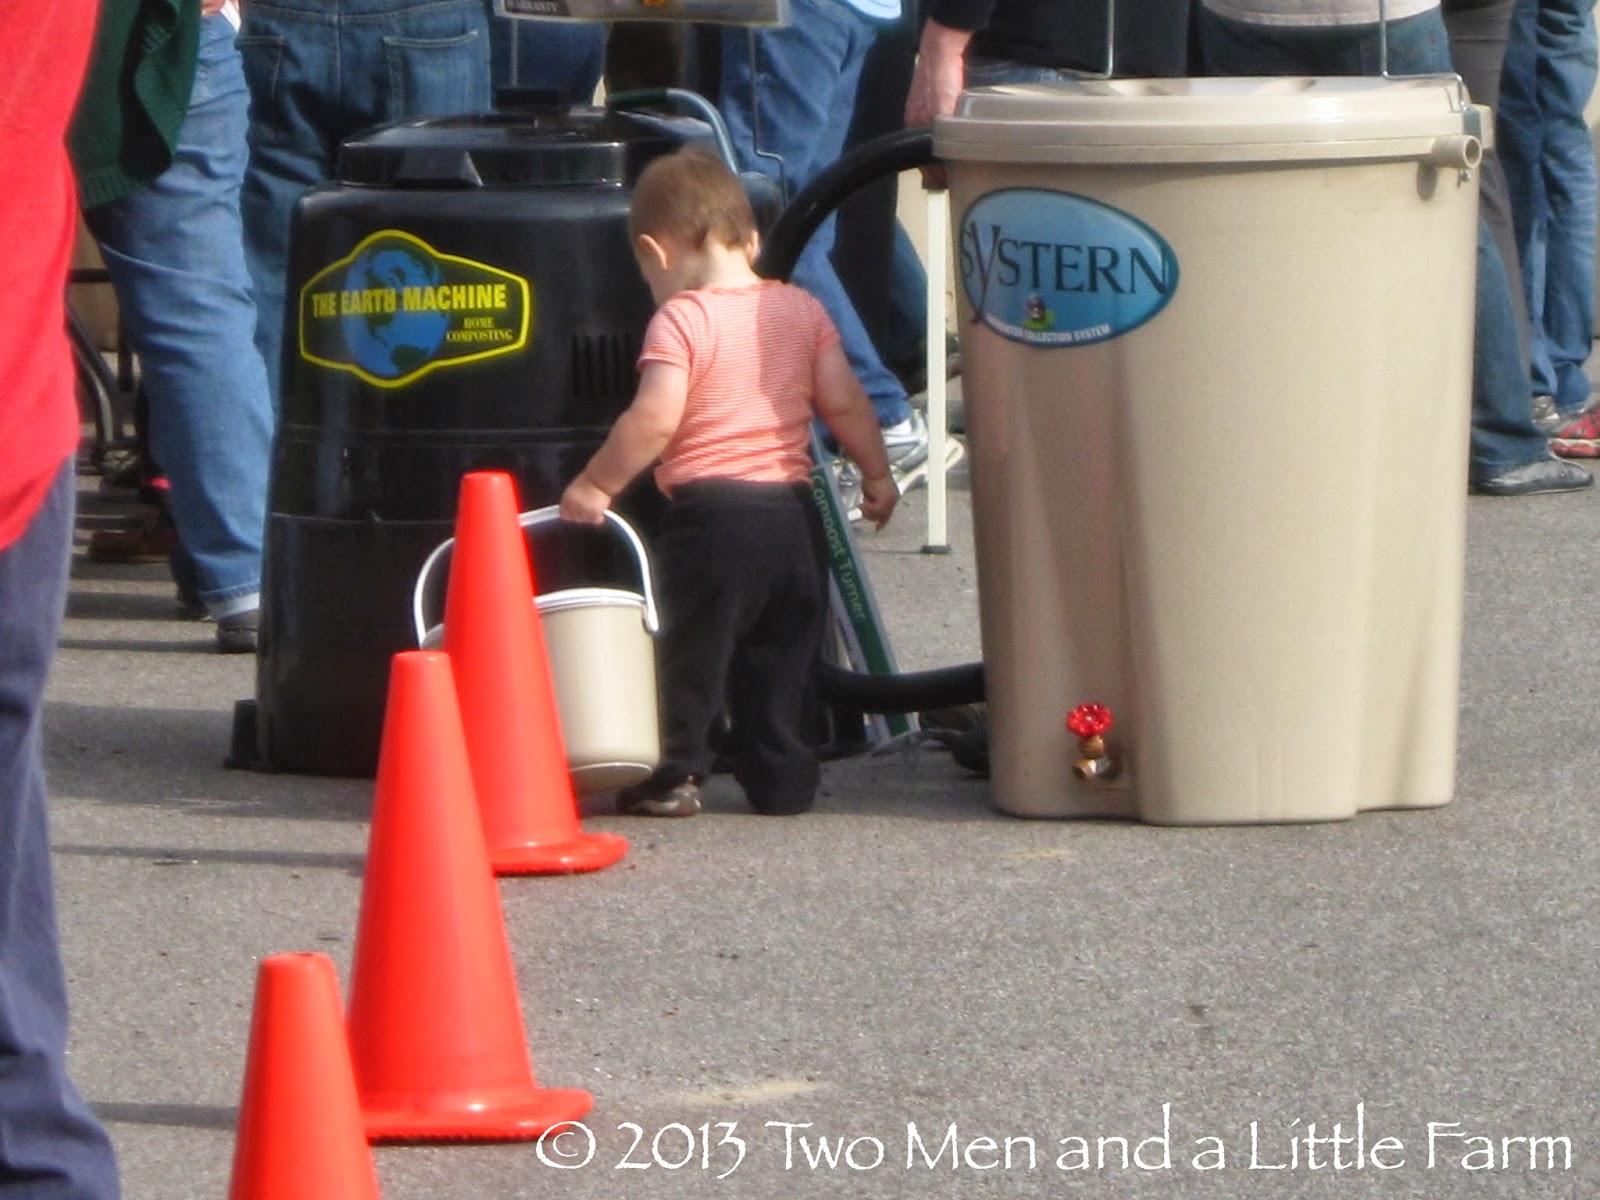 two men and a little farm: houston rain barrel and compost bin sale